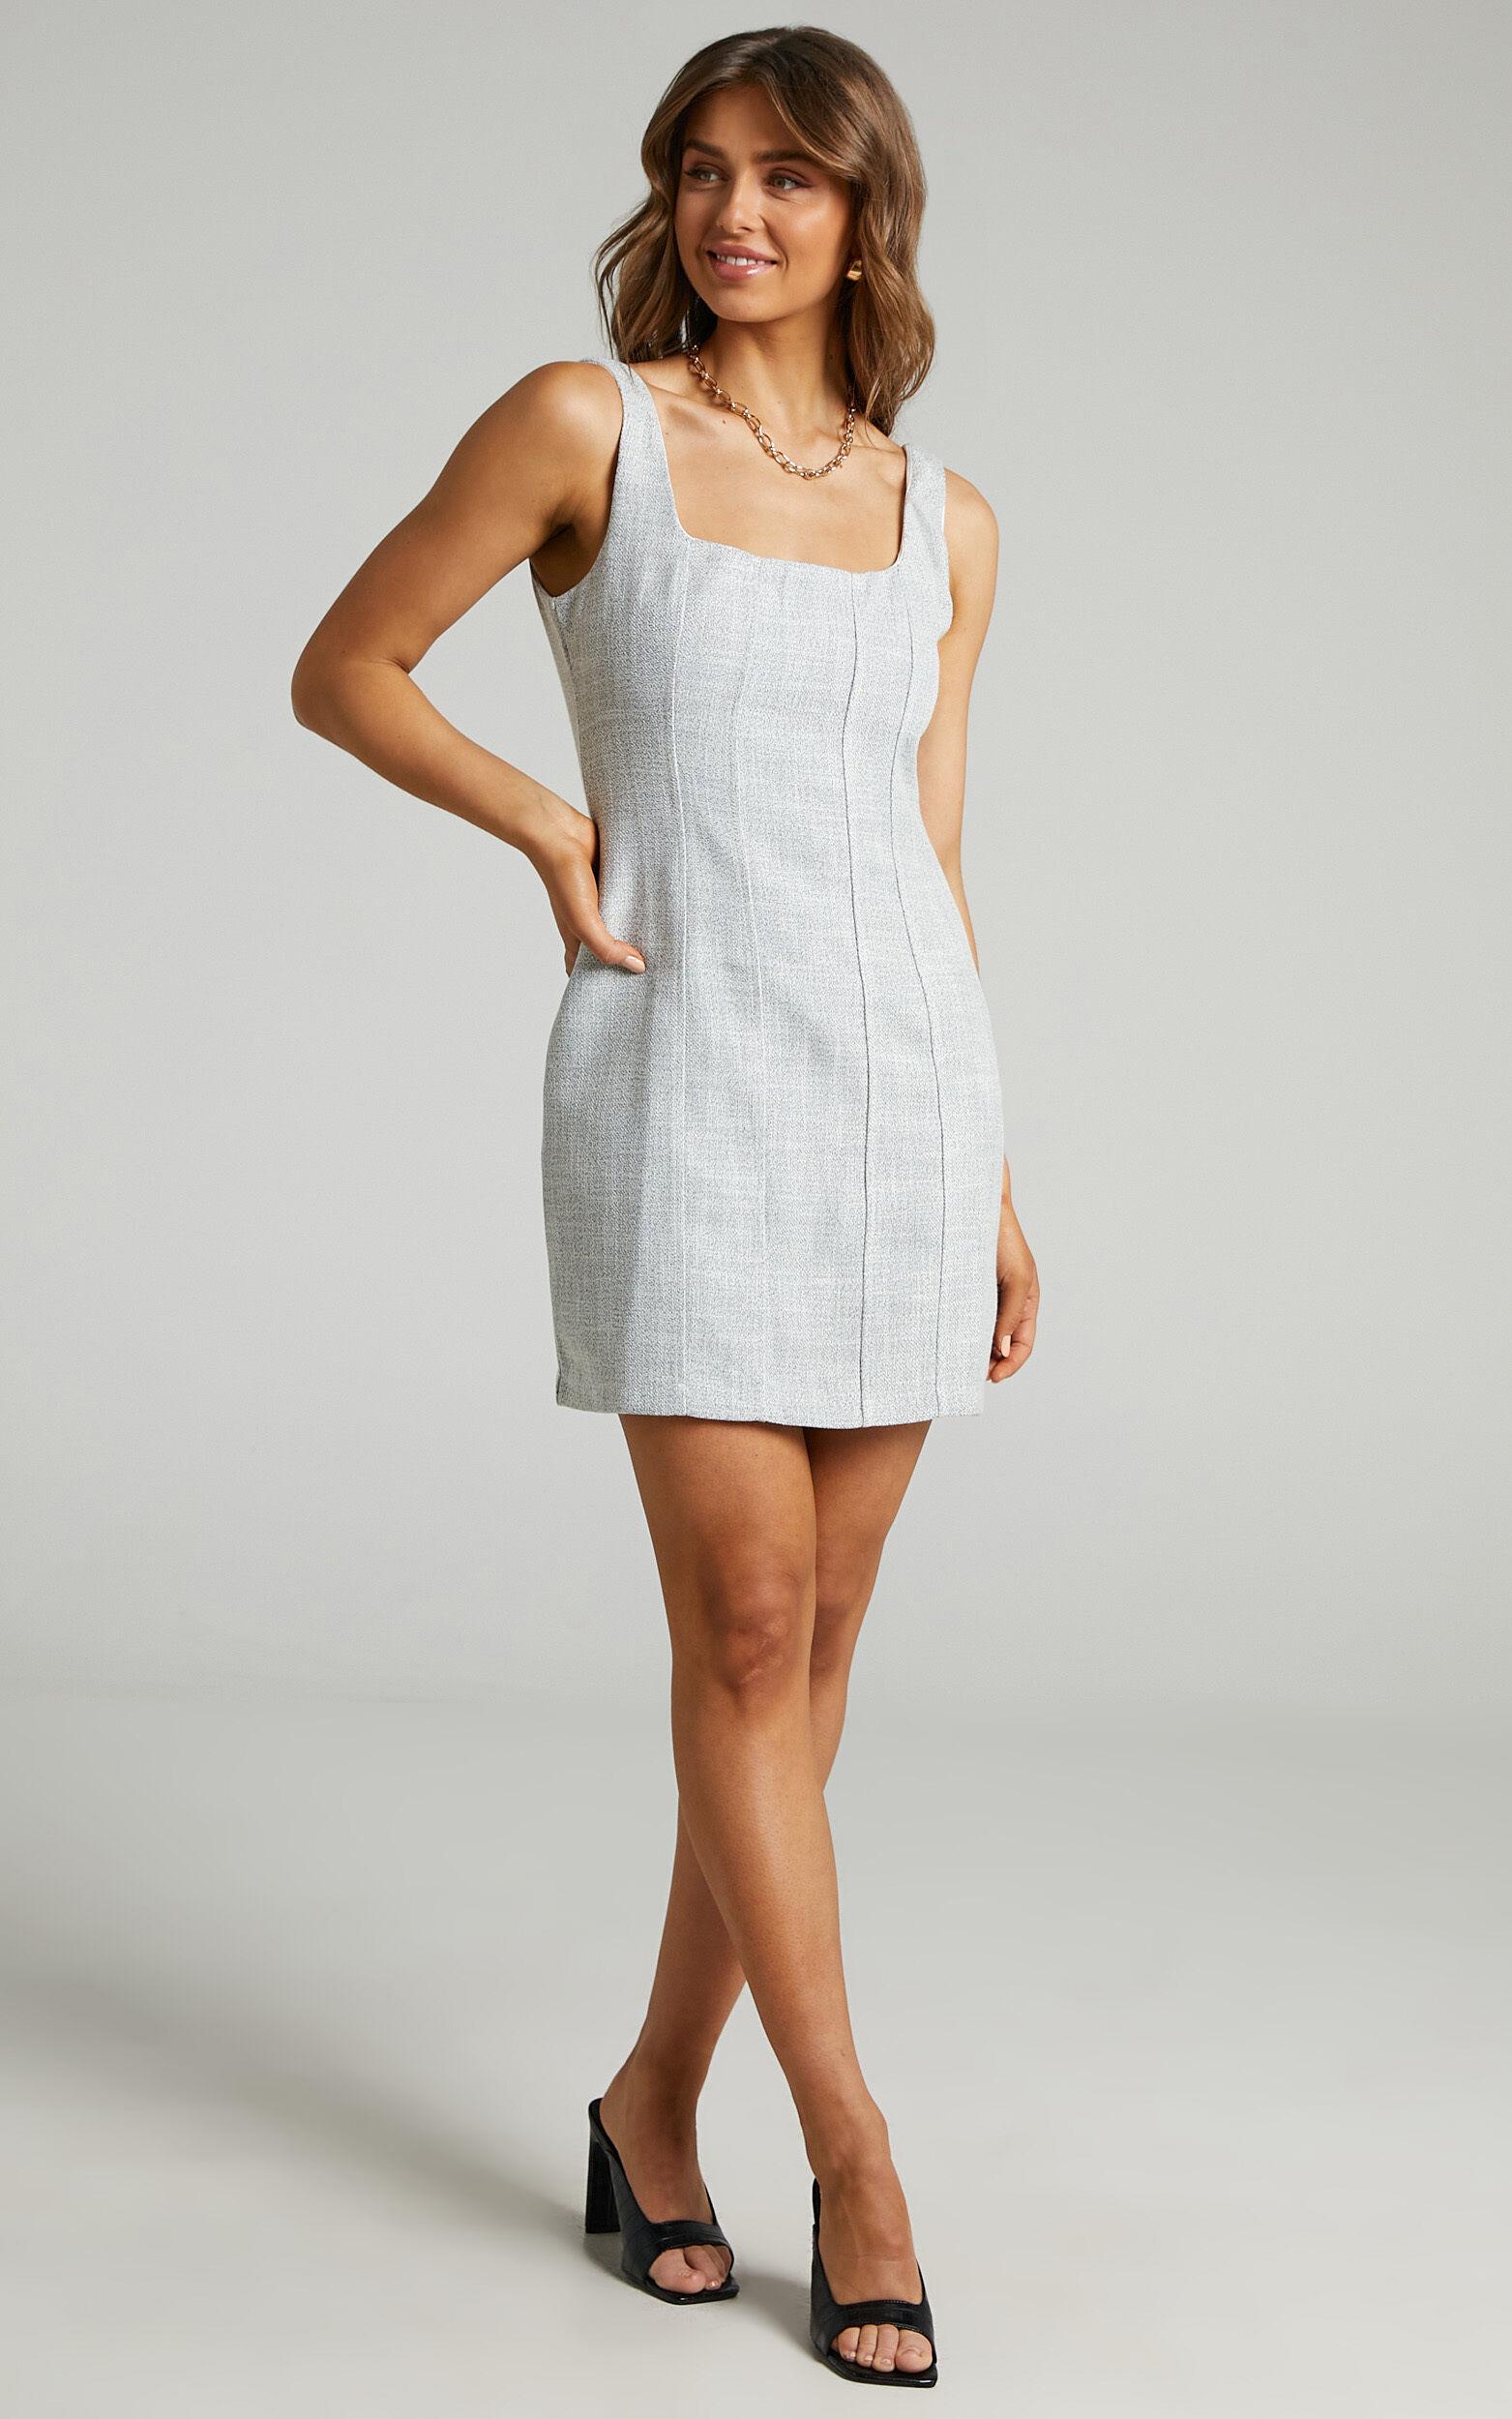 Nimby Mini Panelled Tweed Dress in Cream Tweed - 04, CRE2, super-hi-res image number null